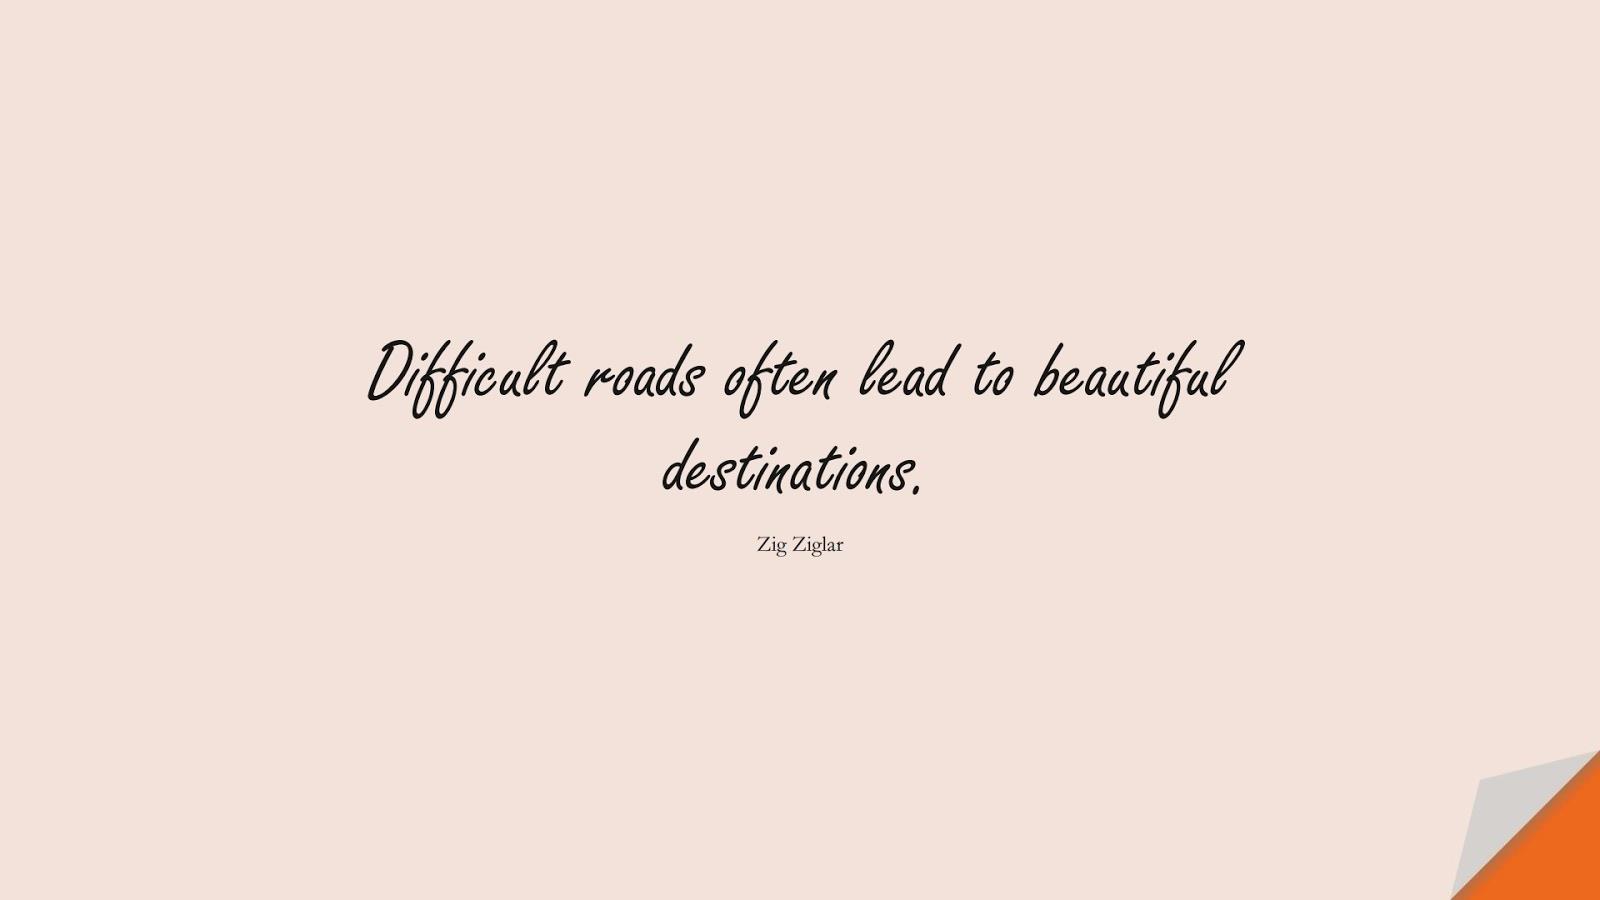 Difficult roads often lead to beautiful destinations. (Zig Ziglar);  #PositiveQuotes